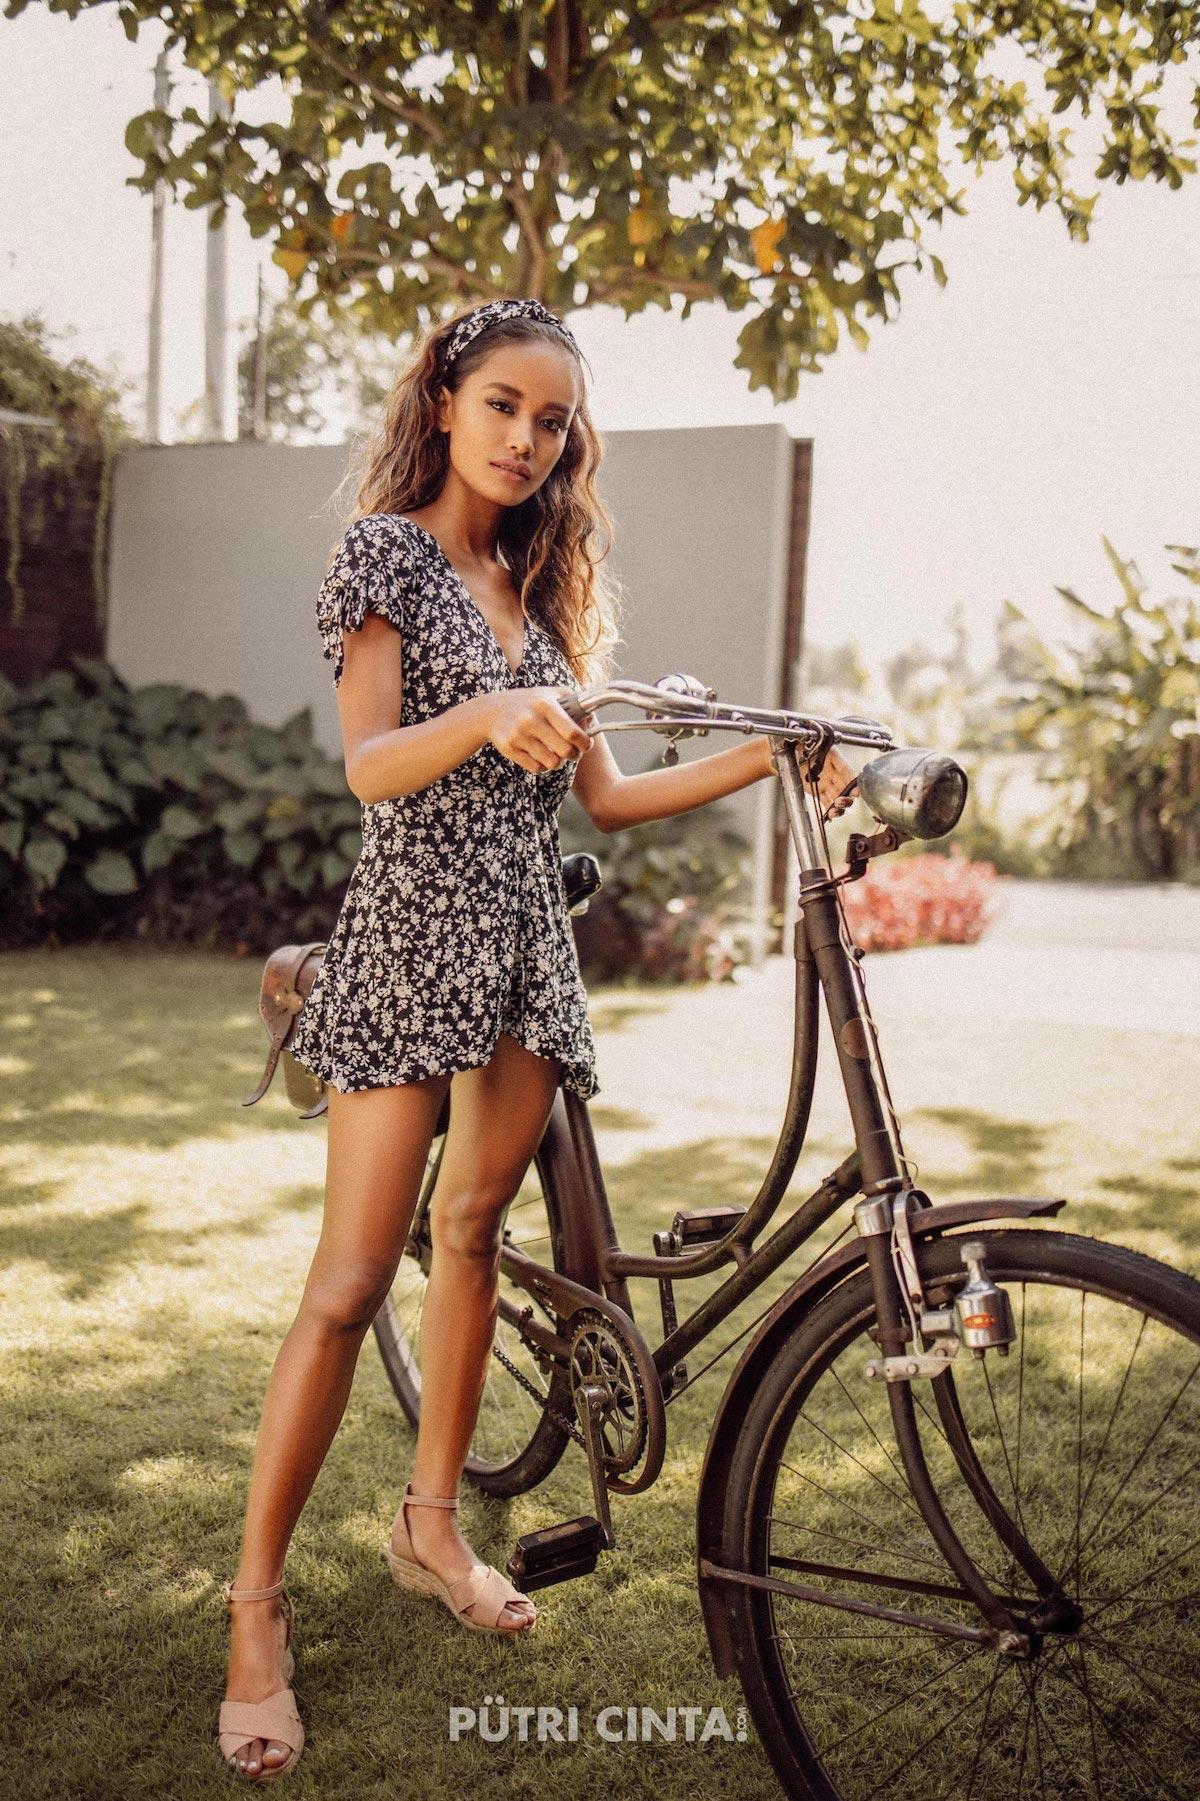 024-Putri-Cinta-Cycling-Commando-photoset-12.jpg